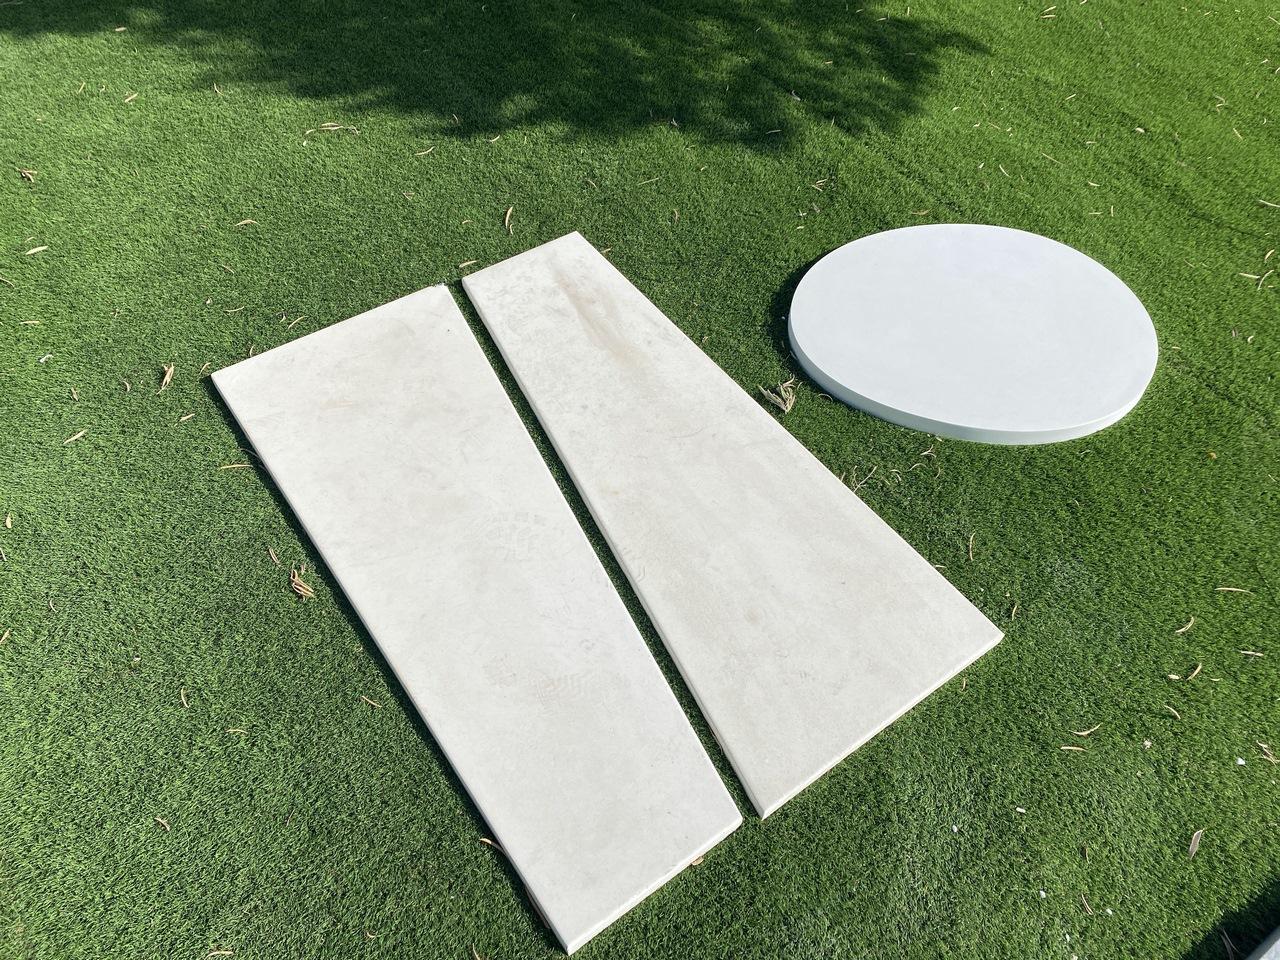 dalles-jardin-beton-pebble_1280x960 (7)